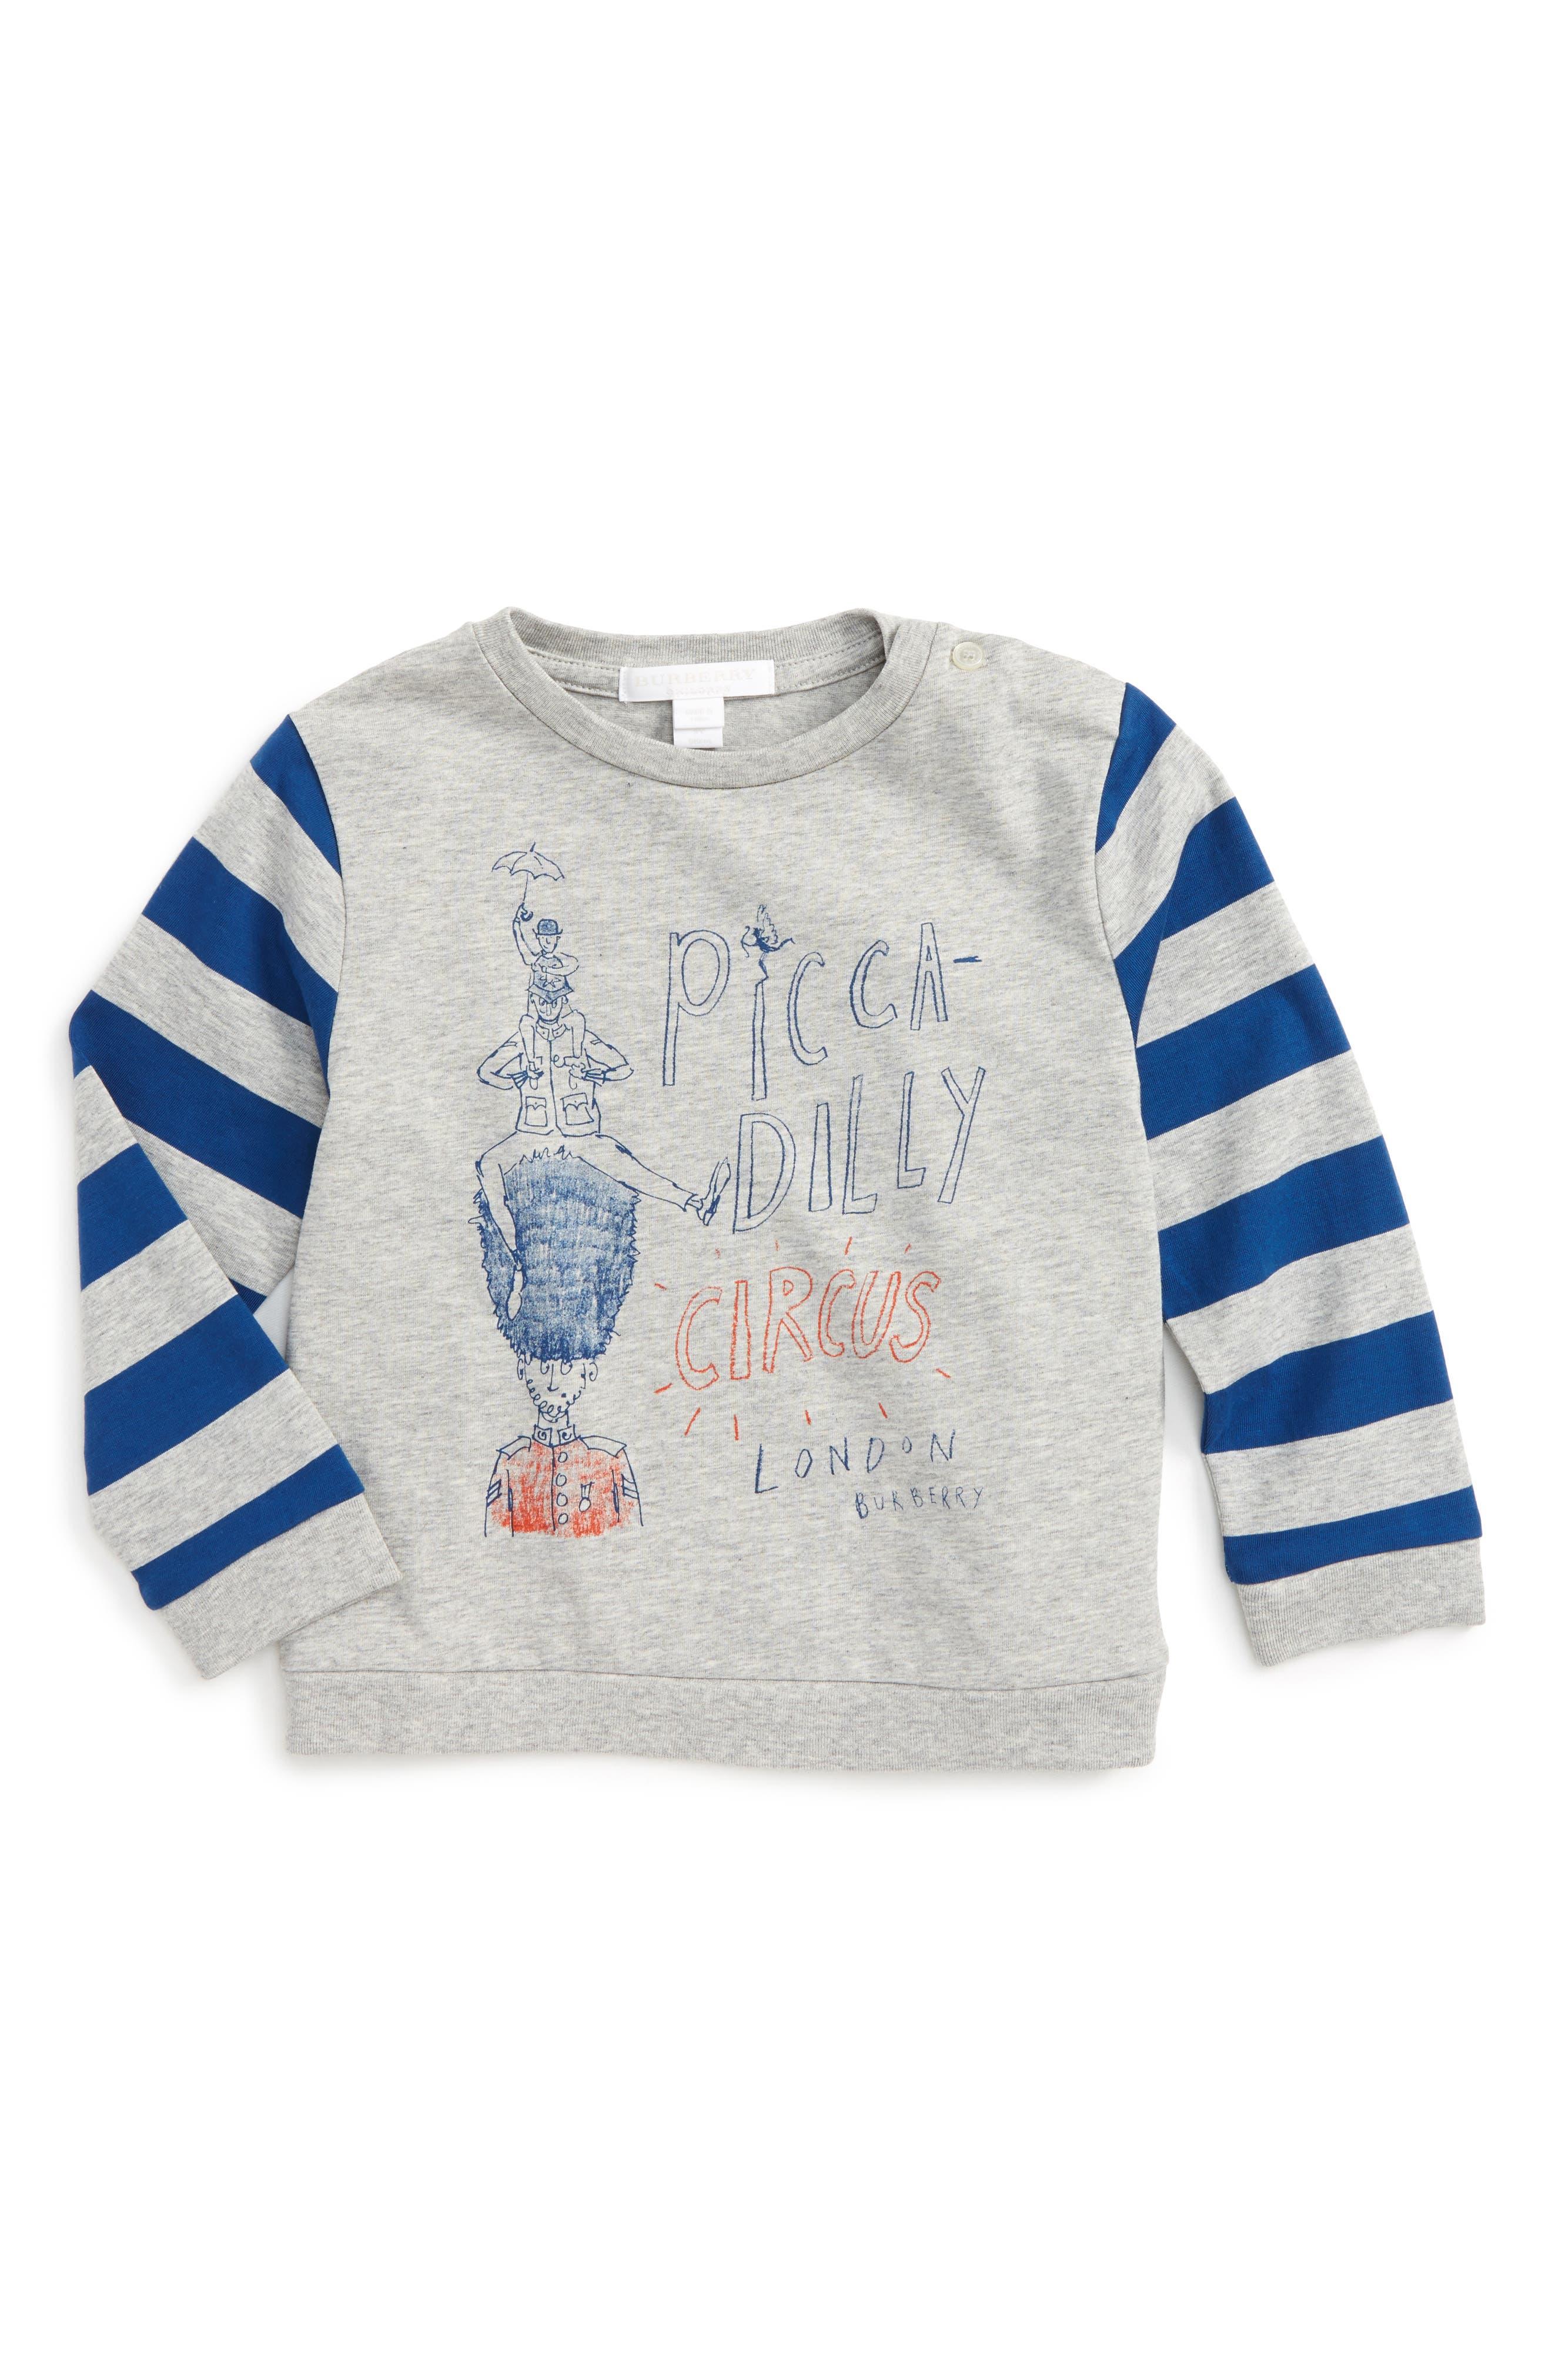 Oliver Graphic Sweatshirt,                         Main,                         color, 020